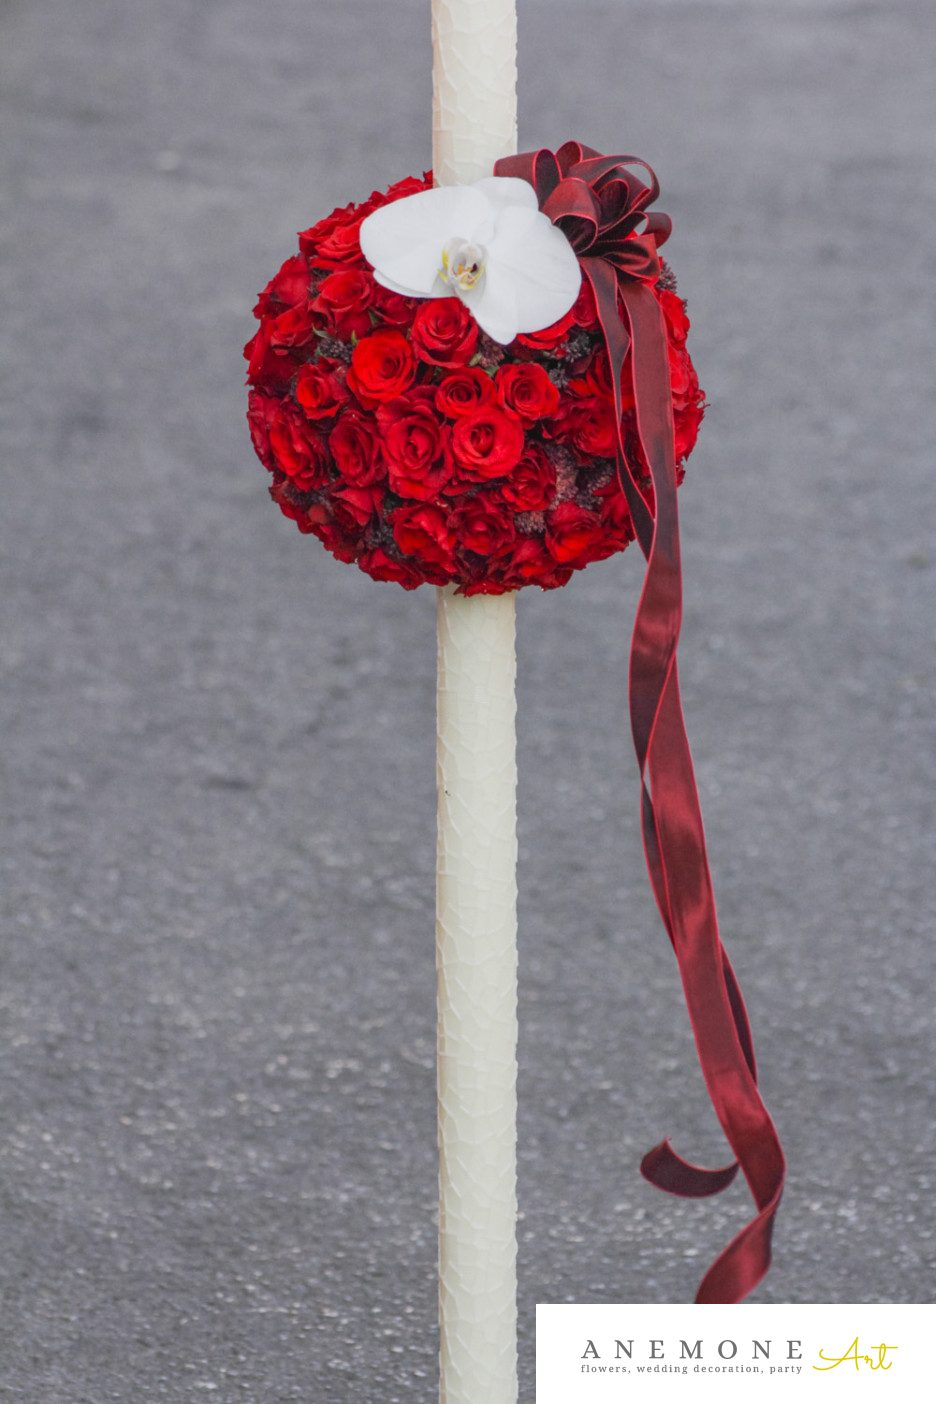 Poza, foto cu Flori de nunta glob, lumanare cununie, orhidee, phalaenopsis, rosu, trandafiri in Arad, Timisoara, Oradea (wedding flowers, bouquets) nunta Arad, Timisoara, Oradea